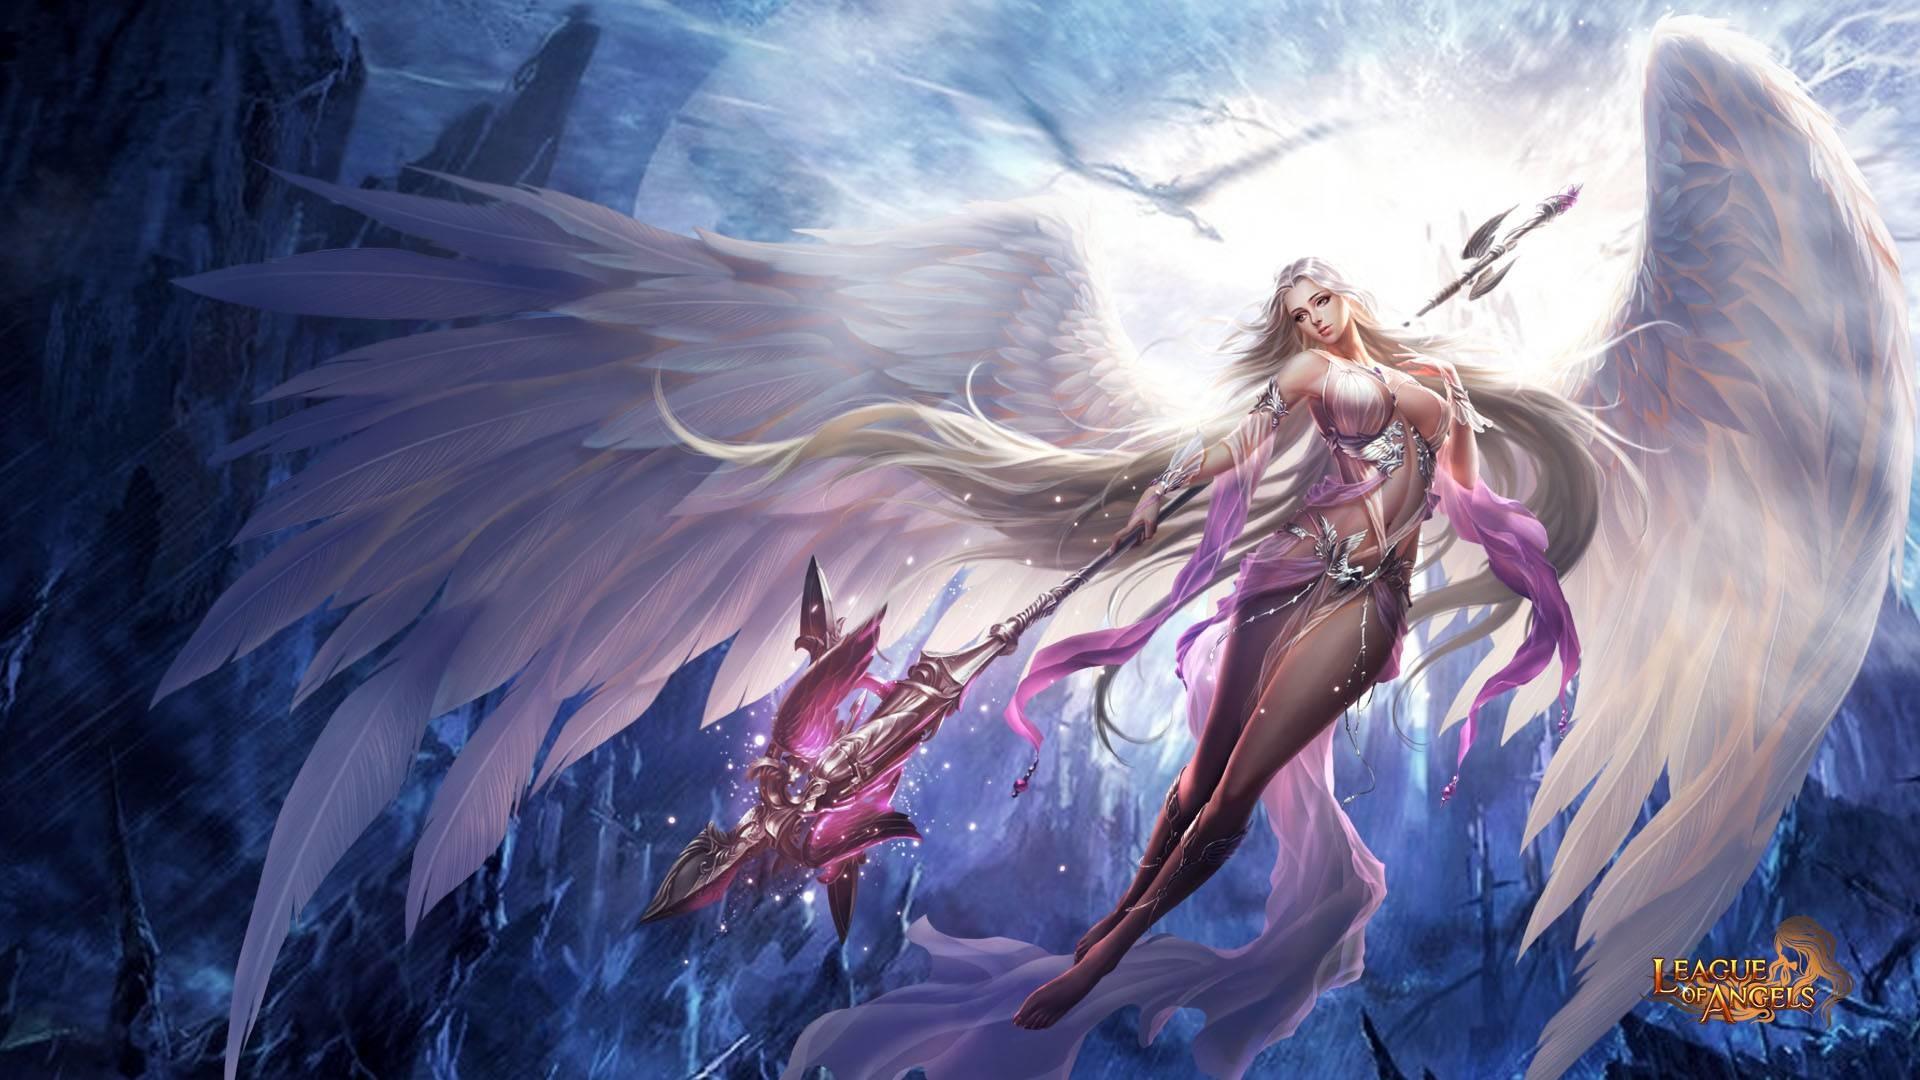 League of Angels wallpaper 2